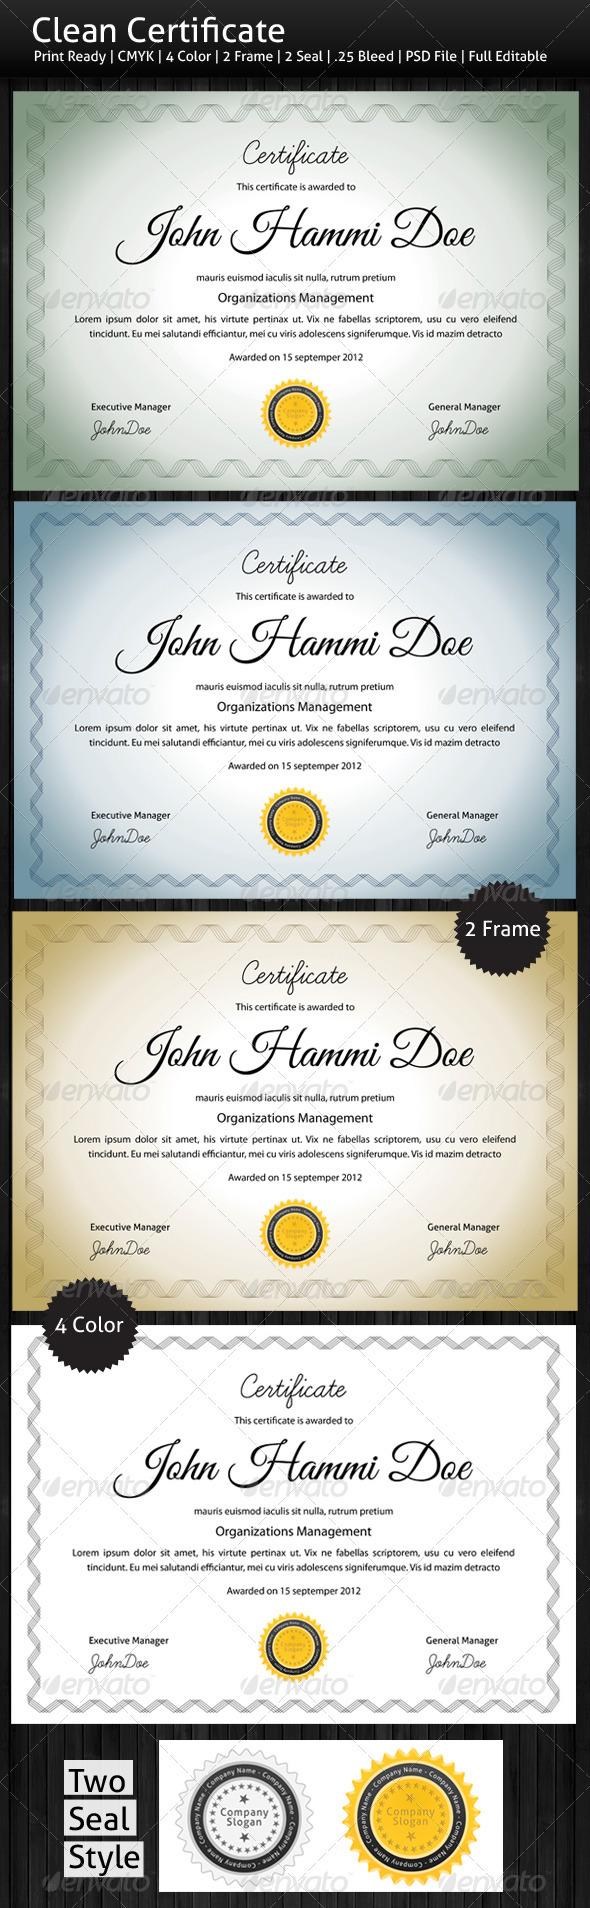 Download Clean Certificate Print Design Template